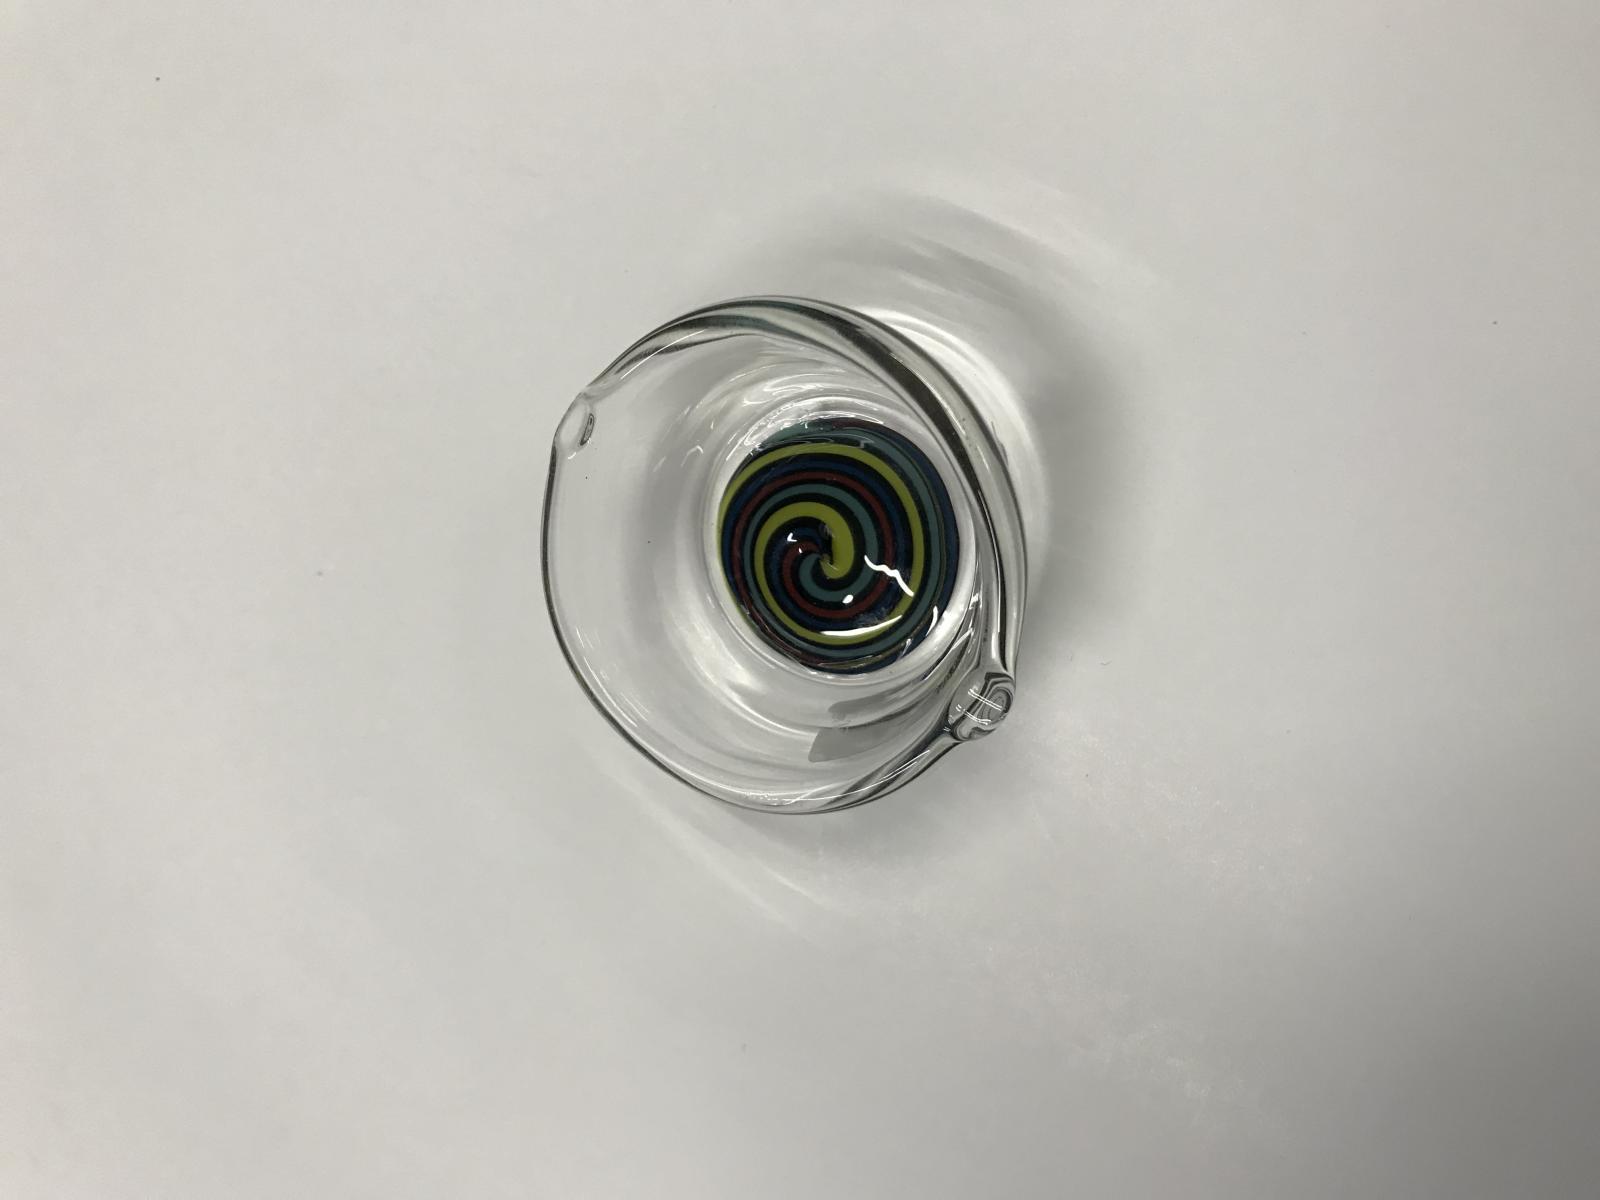 Swirl Nectar Dab Tray